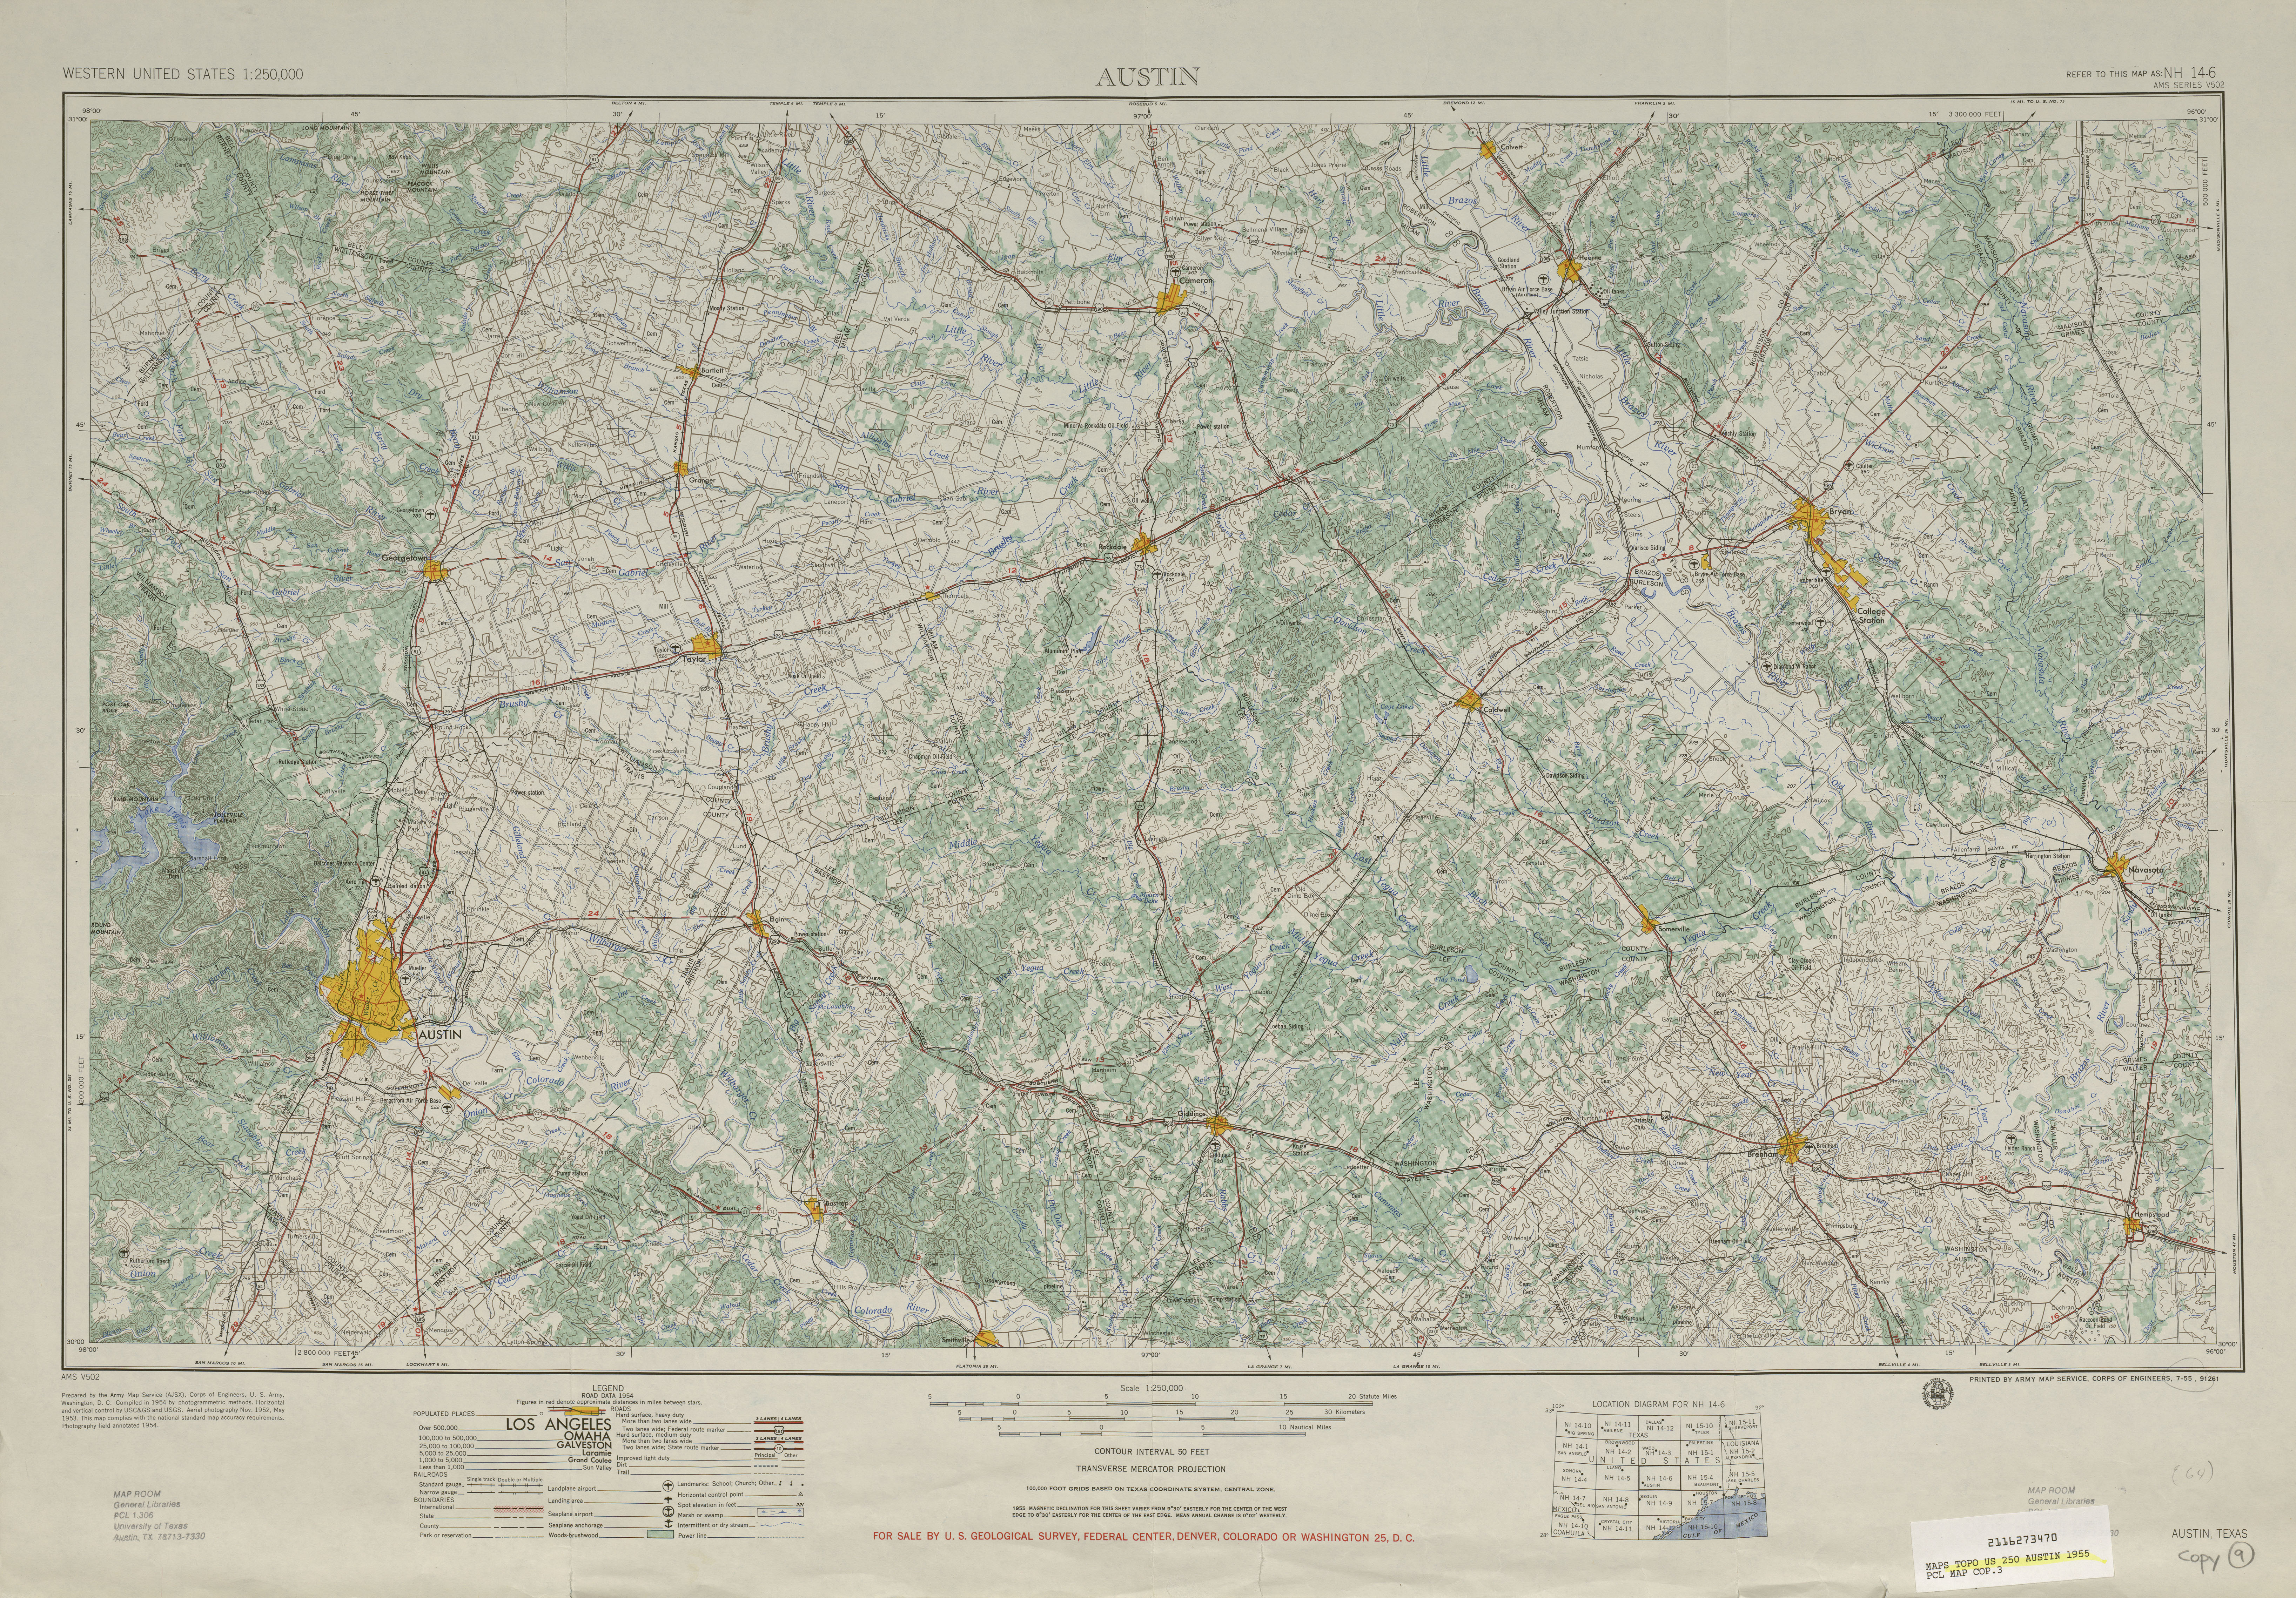 Austin Texas Topographic Maps PerryCastañeda Map Collection - Us interactive topo map